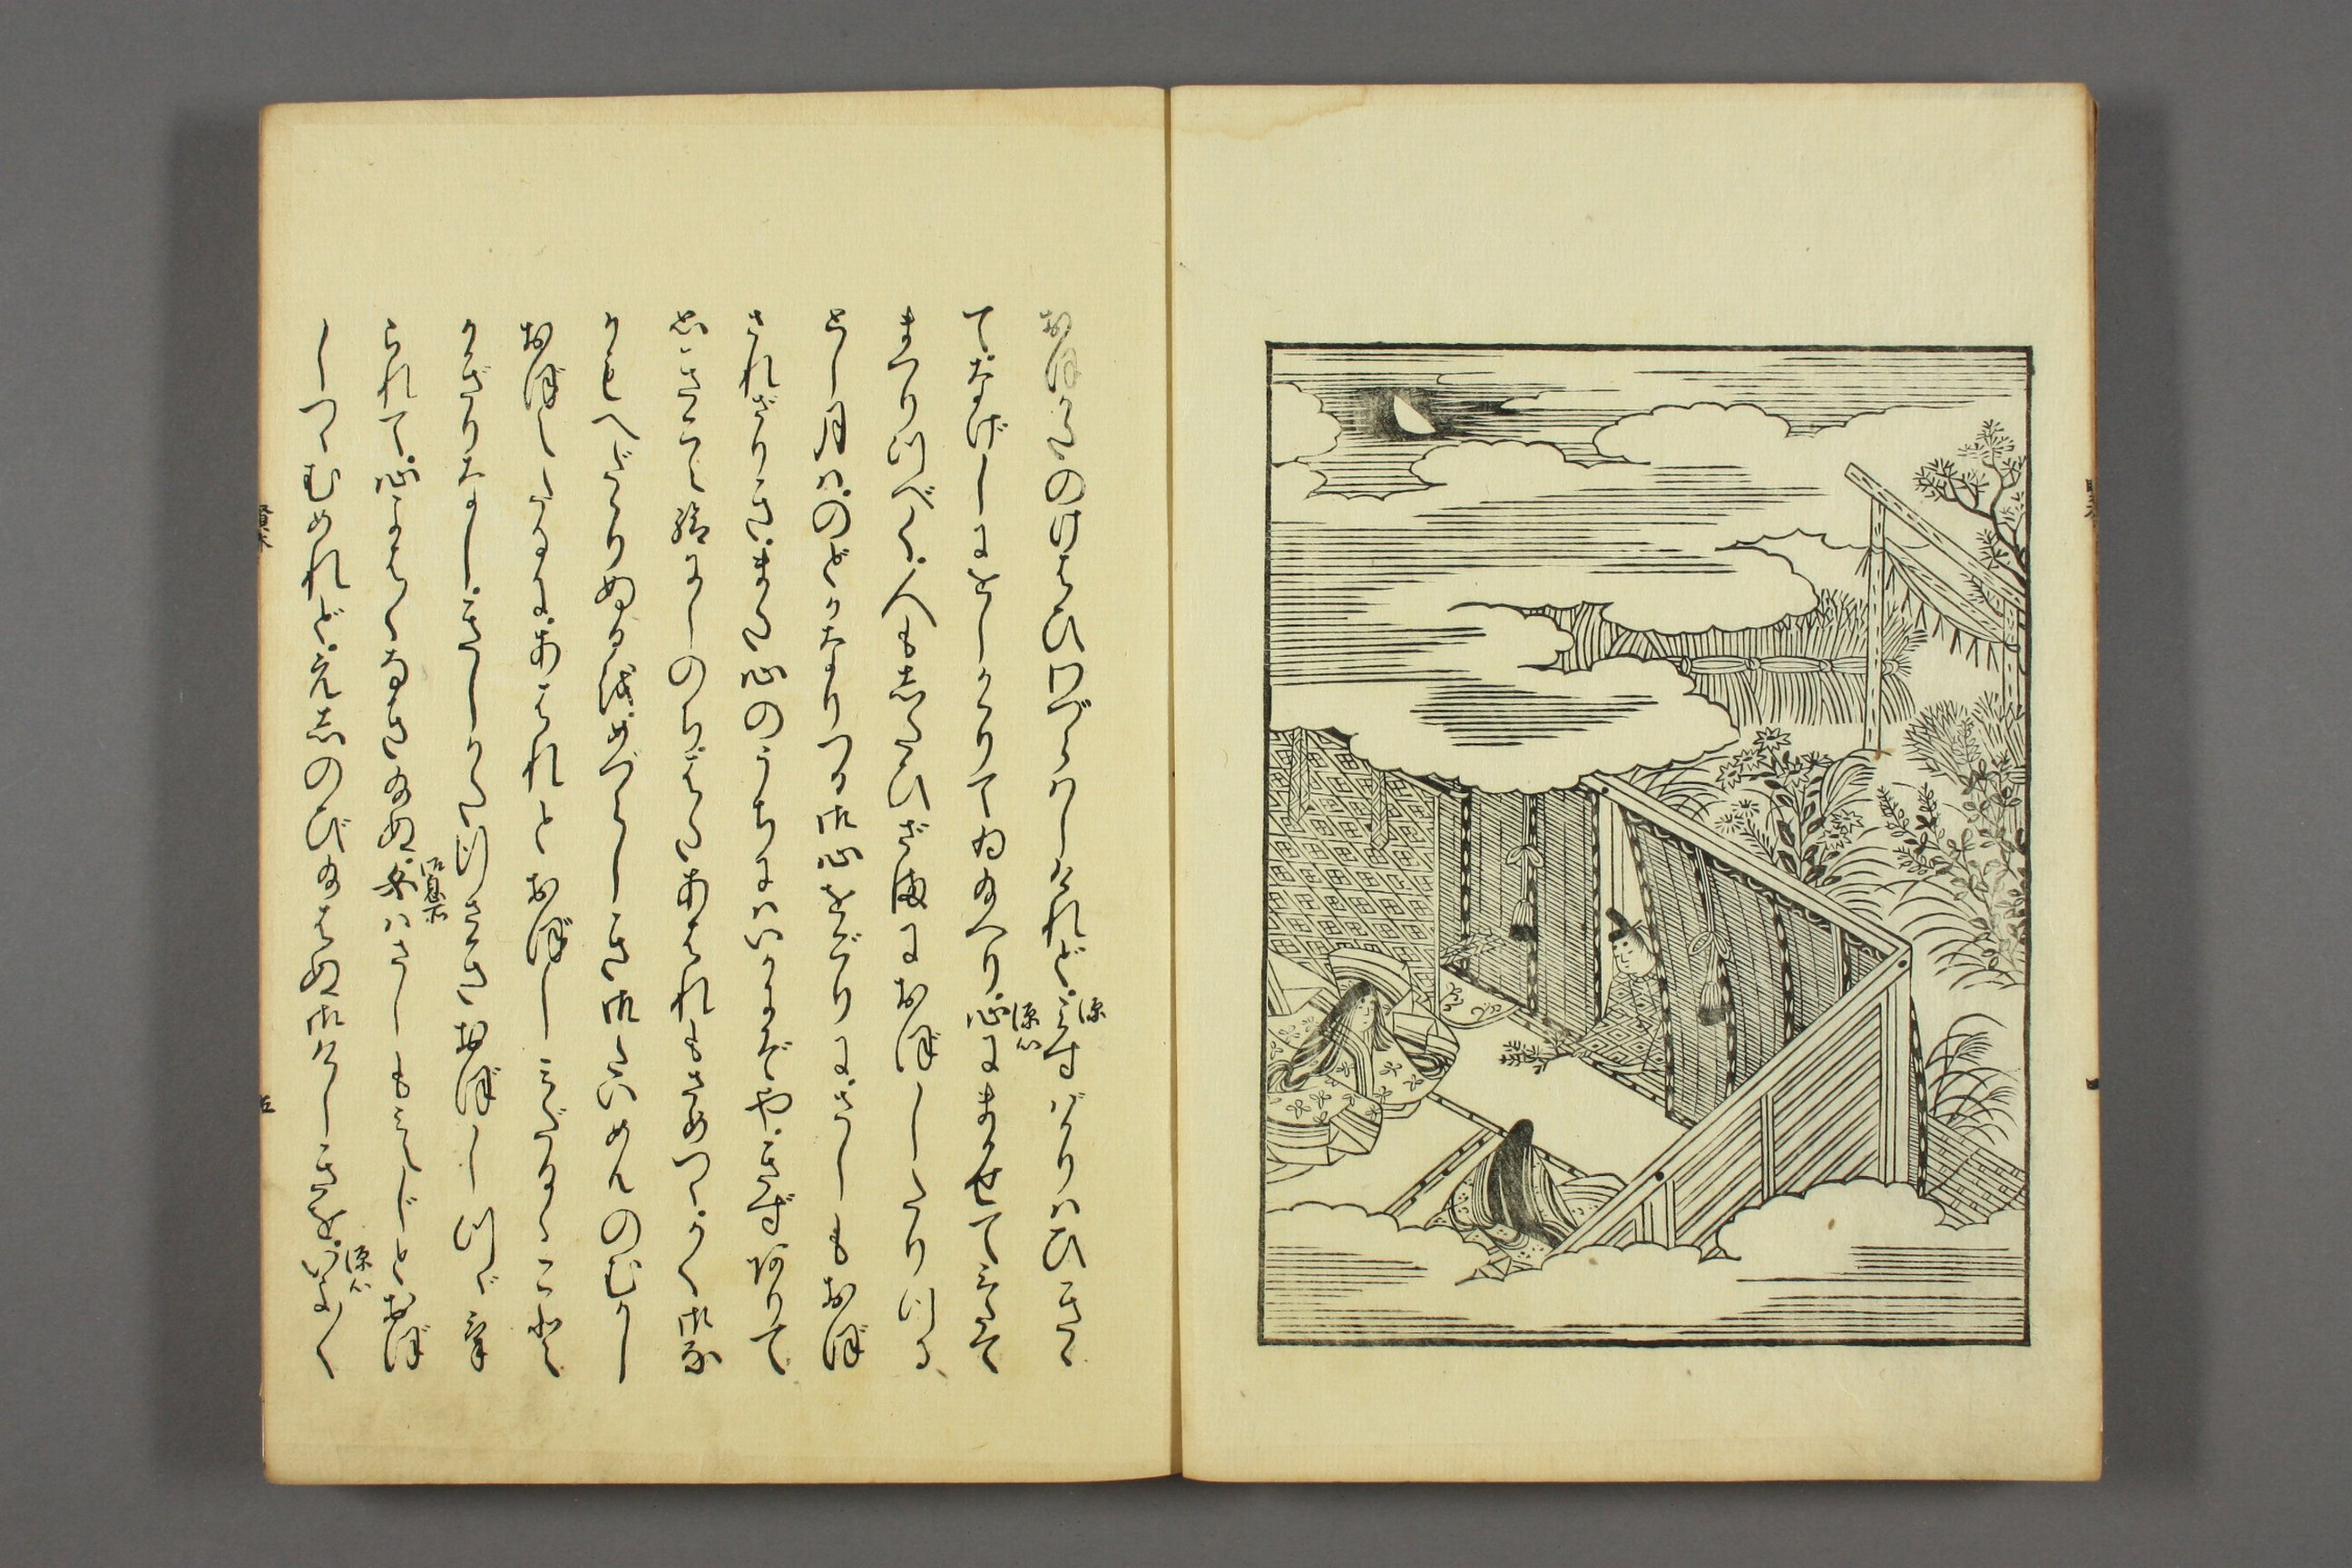 http://archive.wul.waseda.ac.jp/kosho/bunko30/bunko30_a0007/bunko30_a0007_0010/bunko30_a0007_0010_p0006.jpg